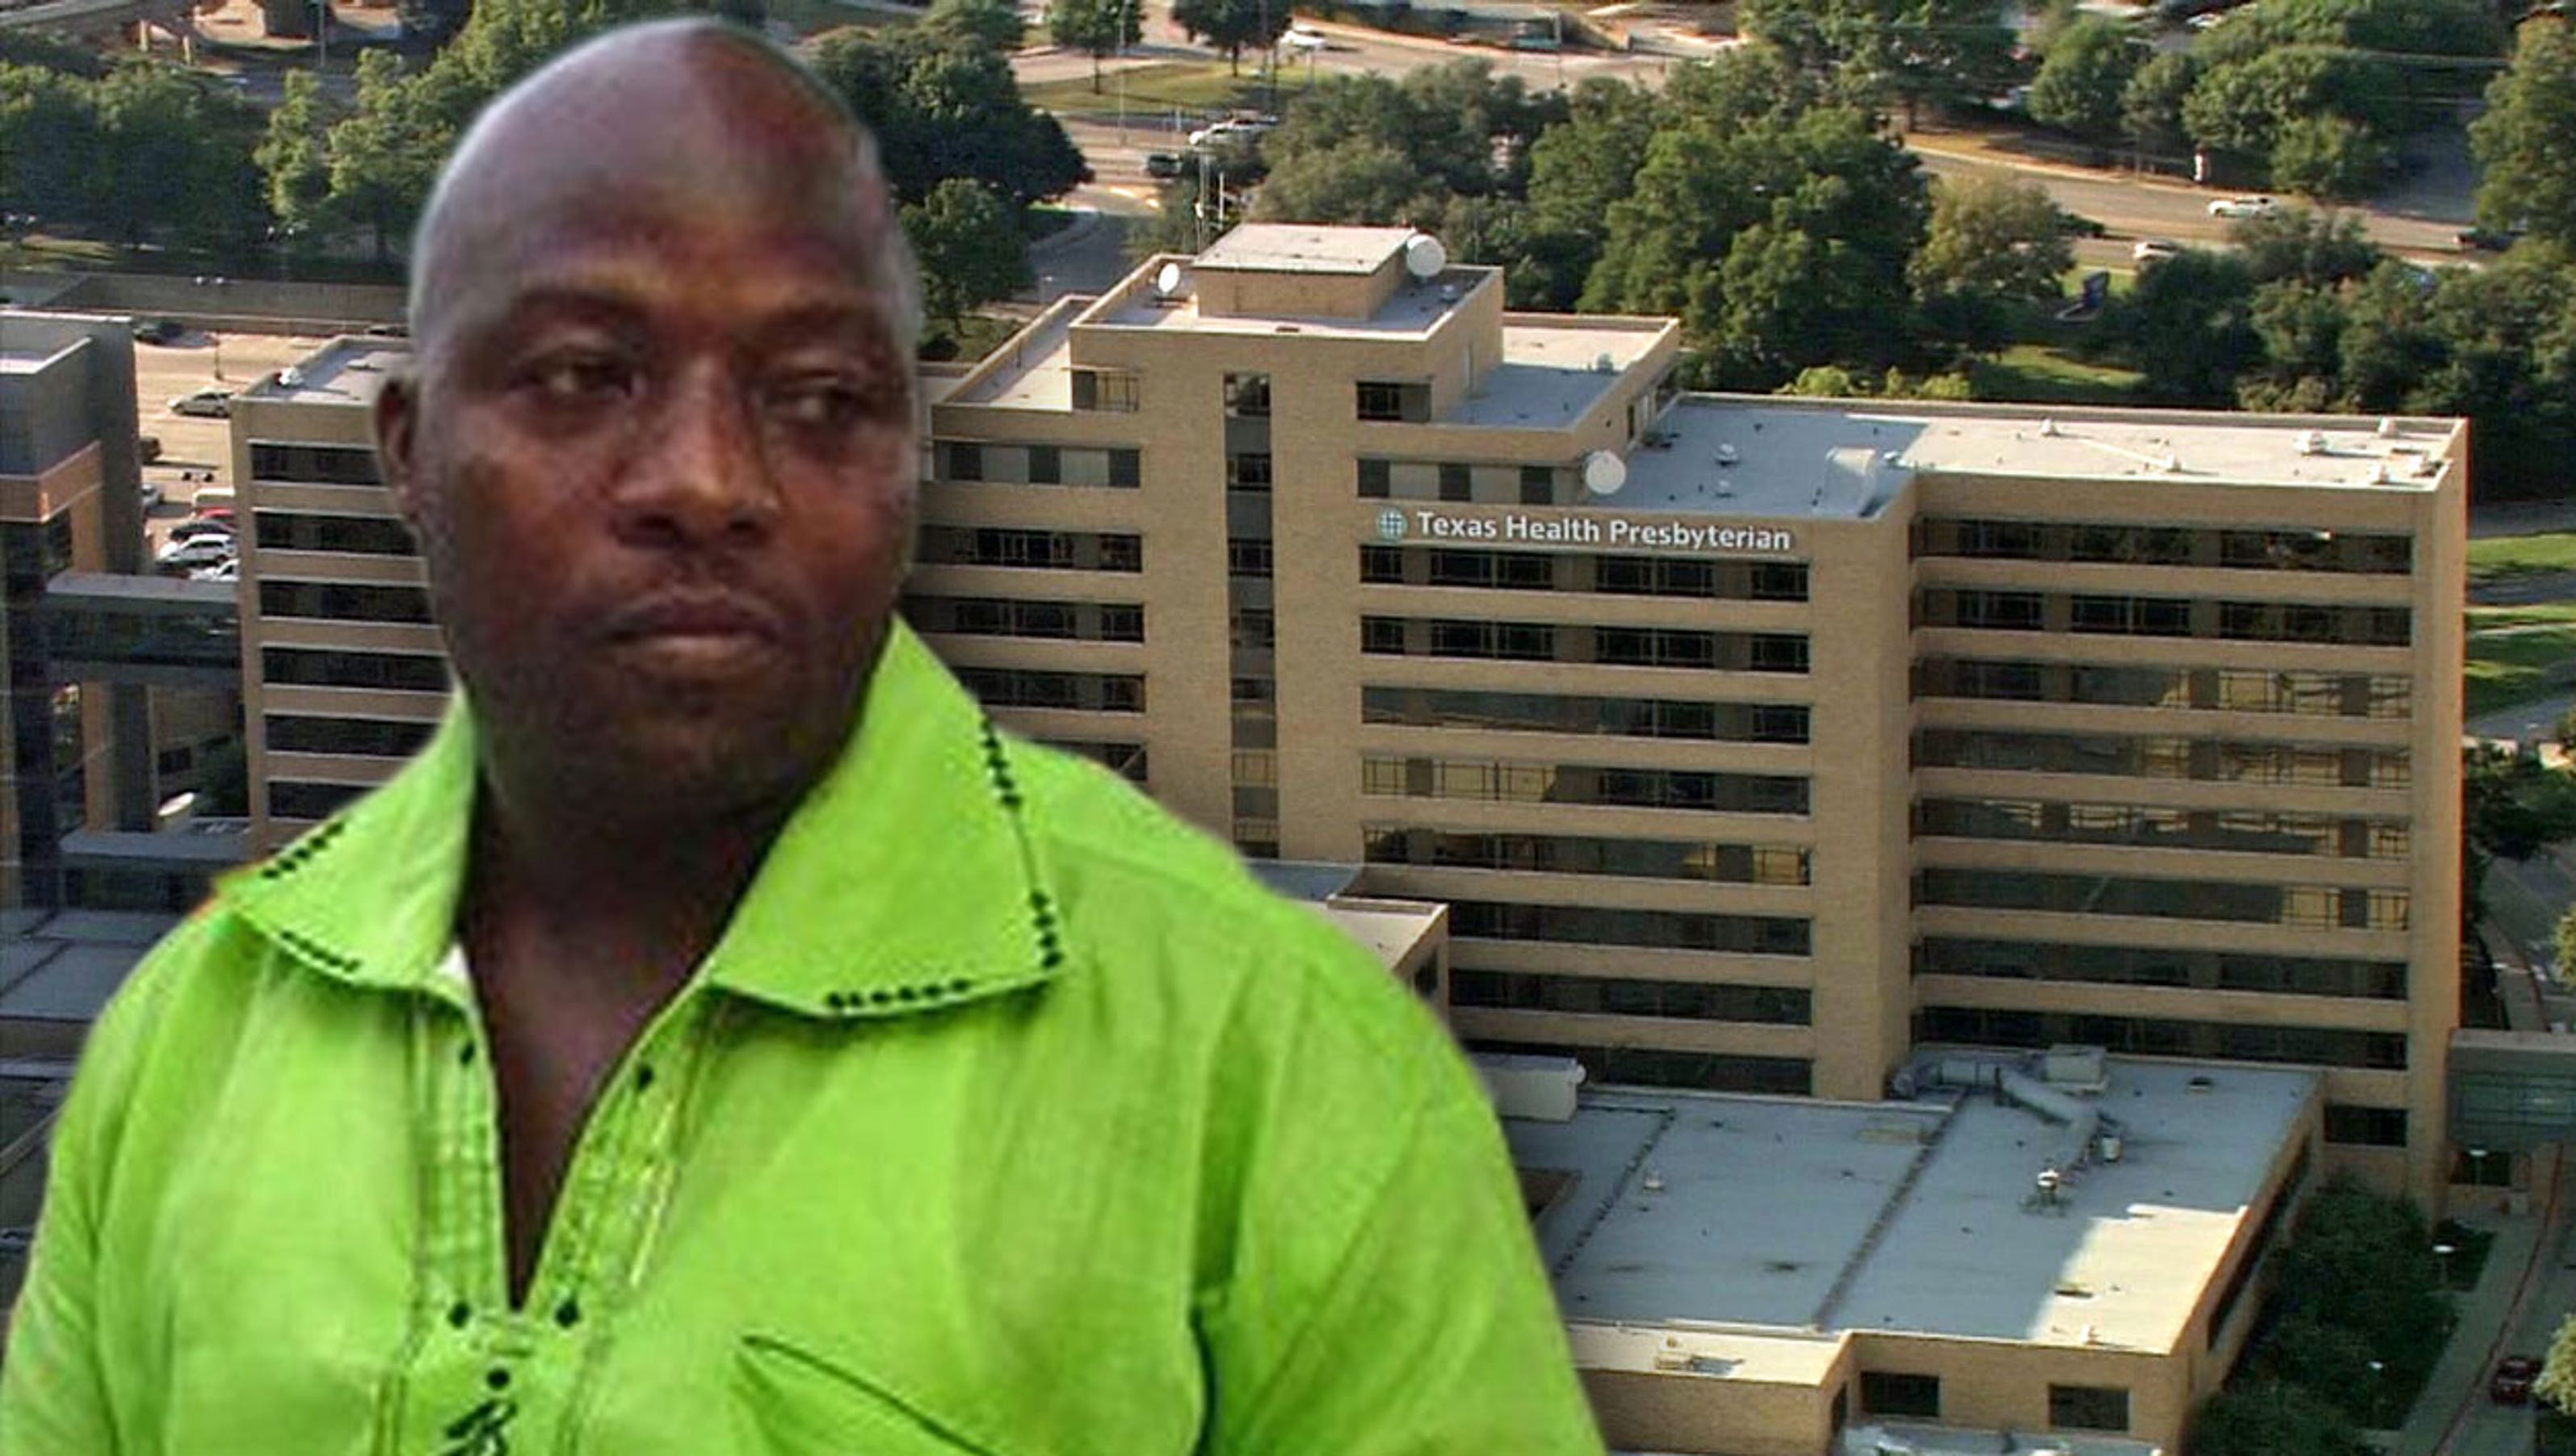 Dallas hospital says Ebola patient - 496.1KB